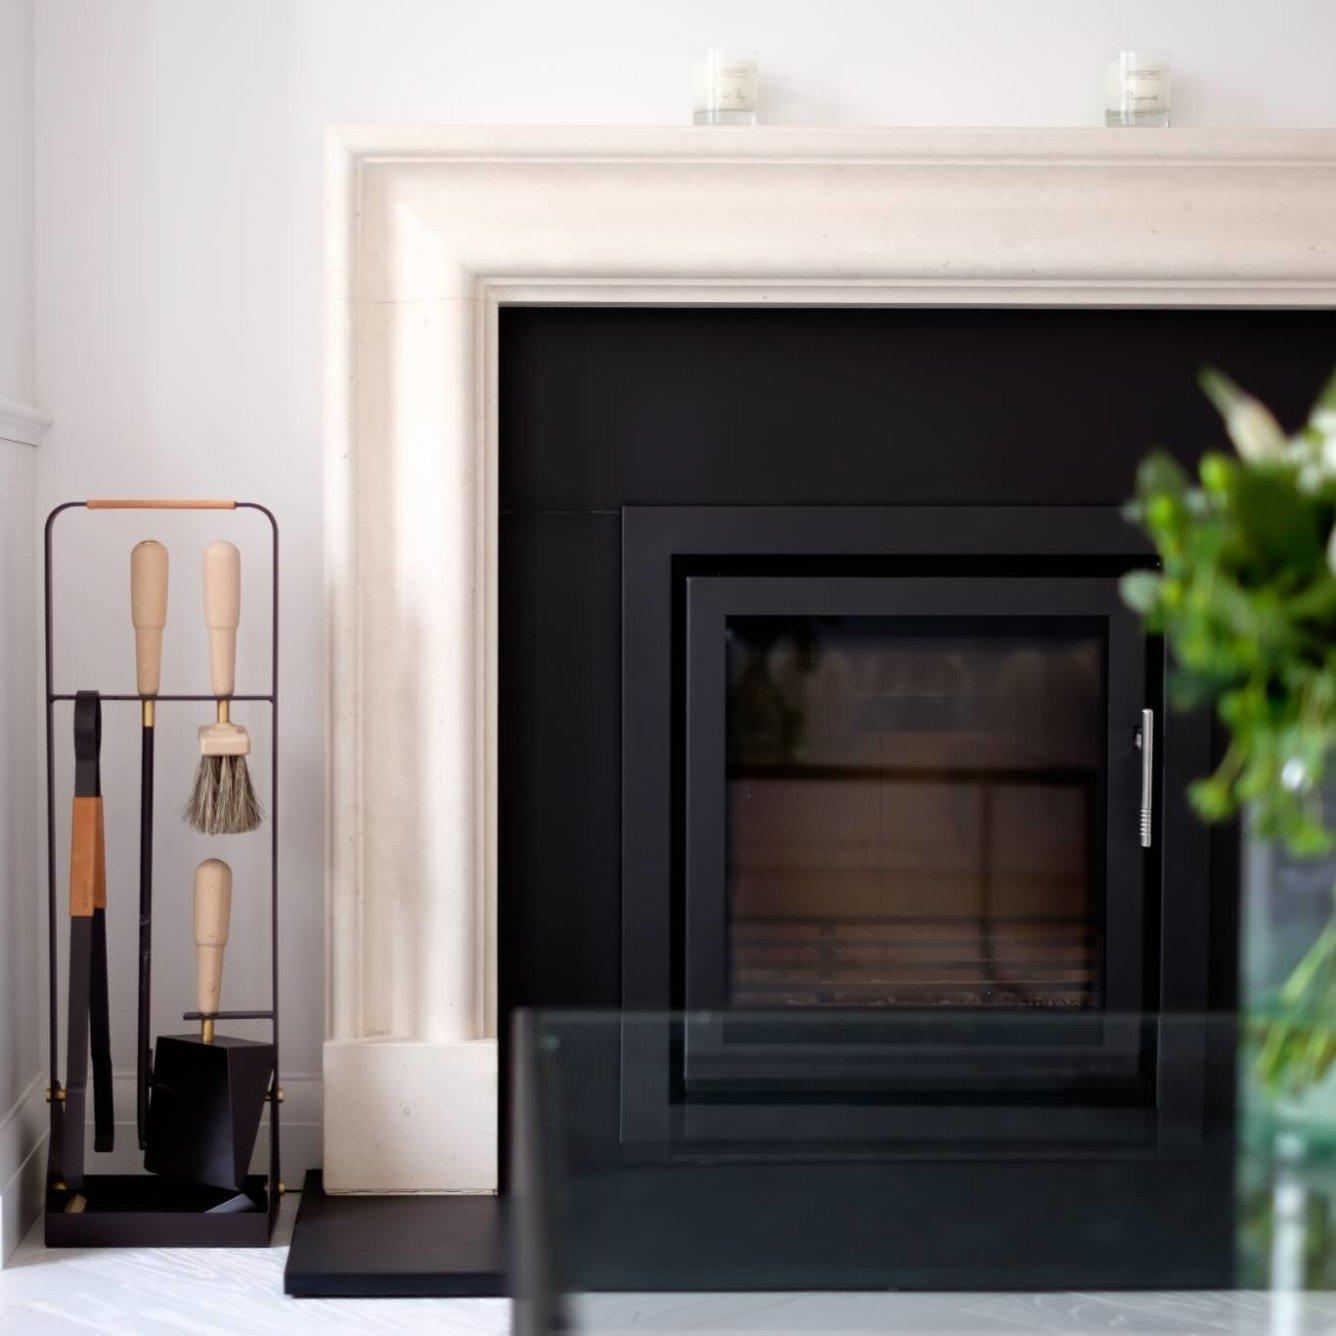 Hampstead Maisonette - bespoke limestone fireplace with wood burner and black slate hearth